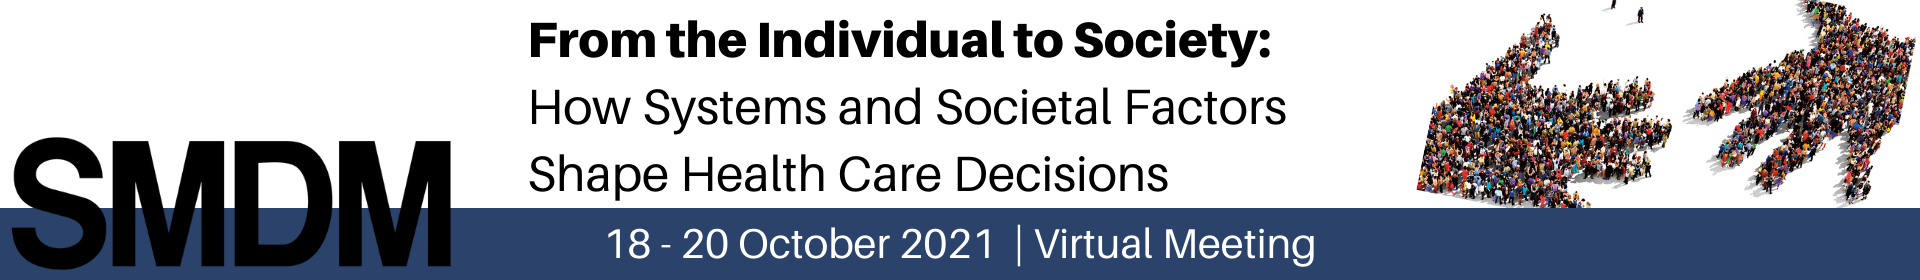 43rd Annual Virtual Meeting Event Banner